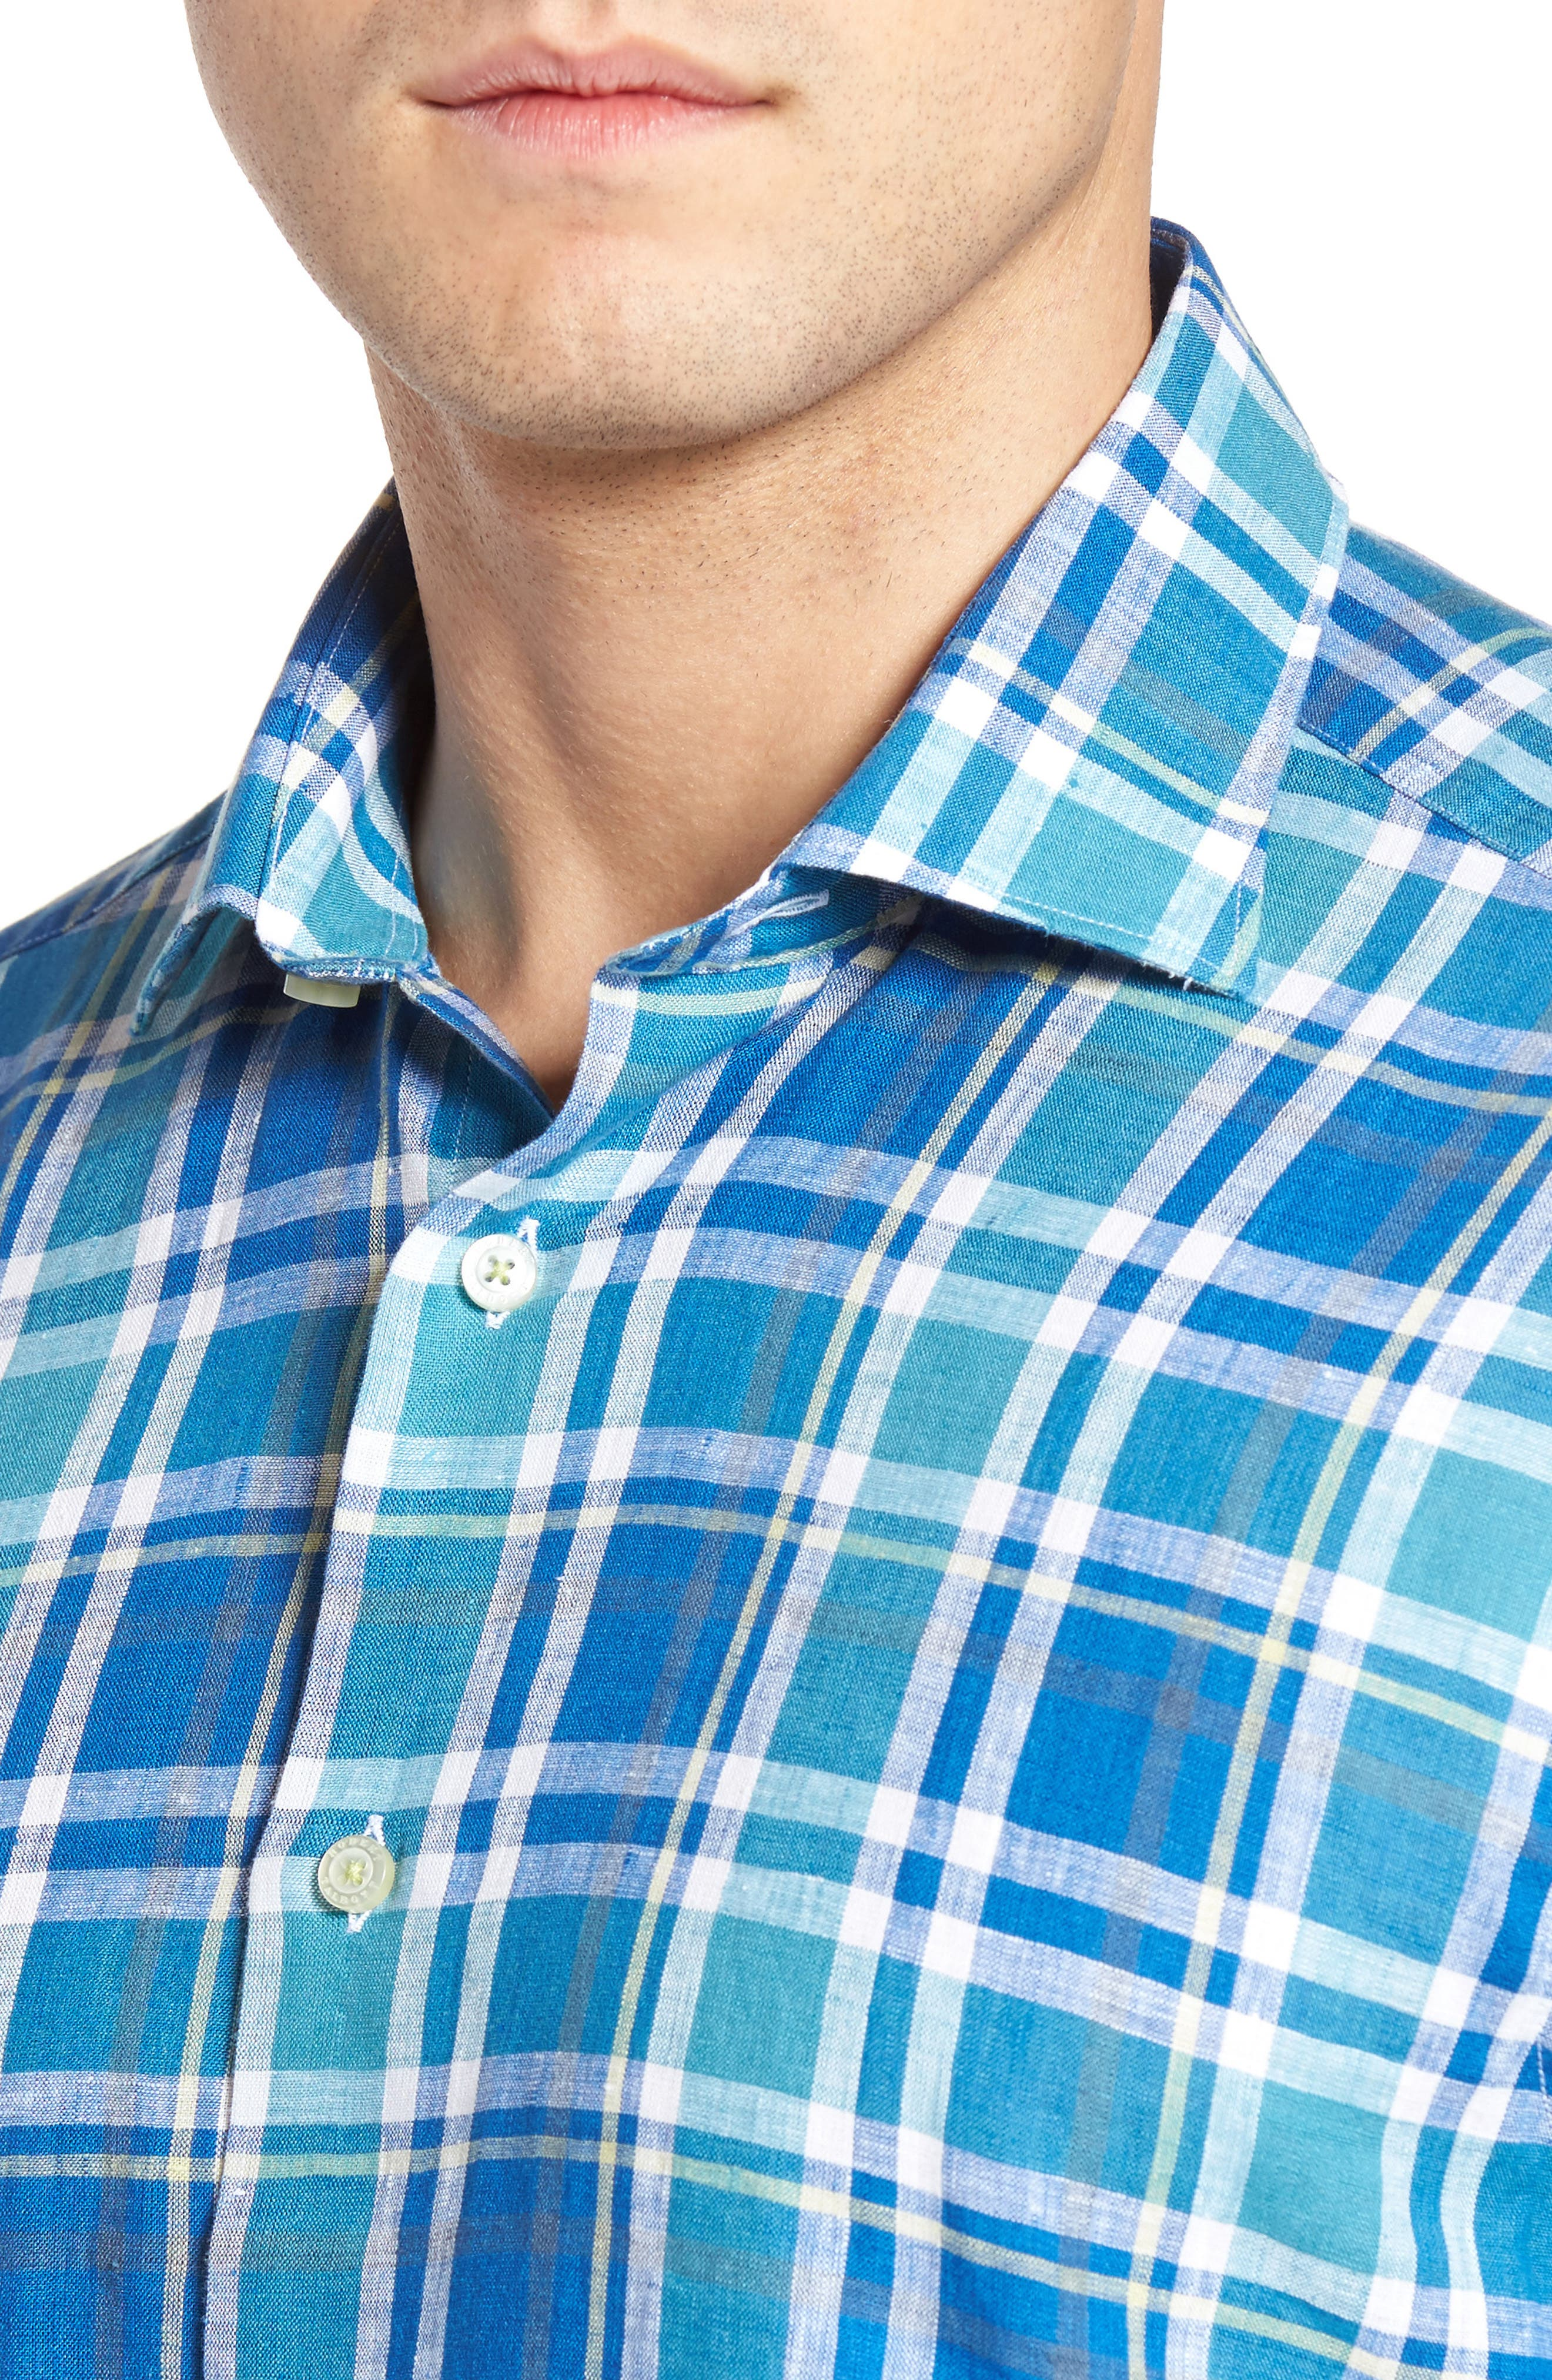 Crespi IV Tailored Fit Sport Shirt,                             Alternate thumbnail 2, color,                             Teal